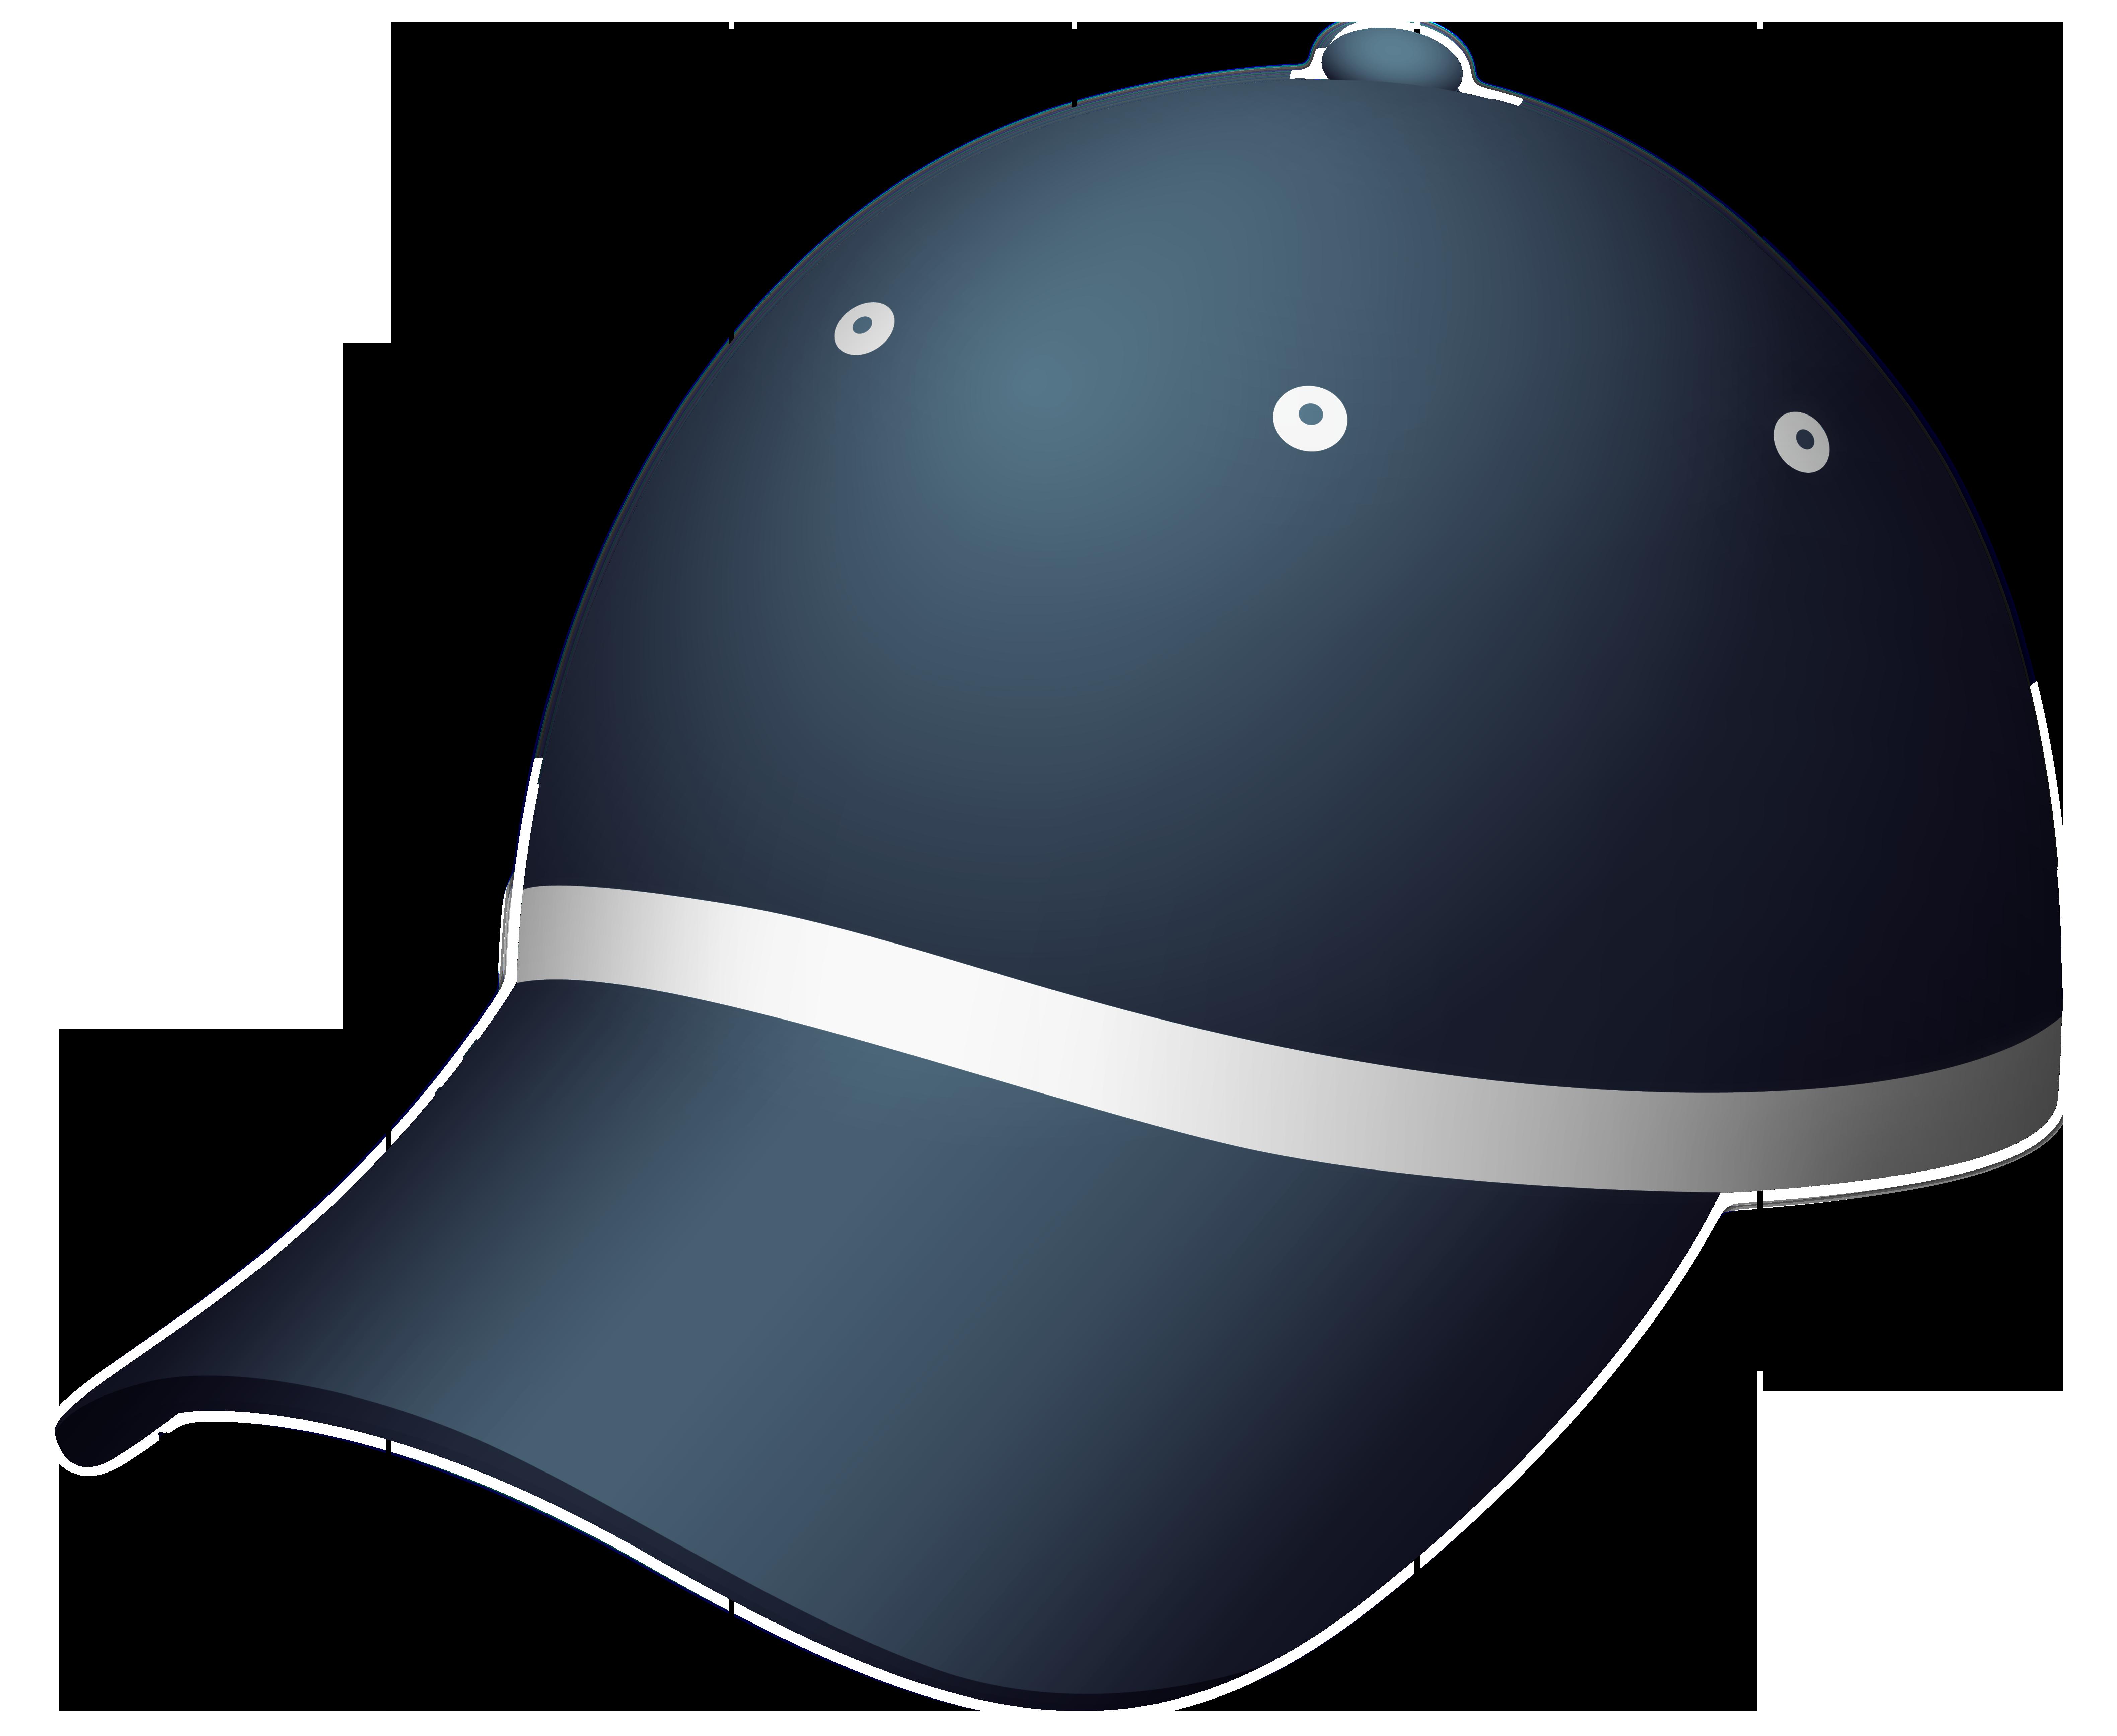 Navy Blue Cap PNG Clipart.